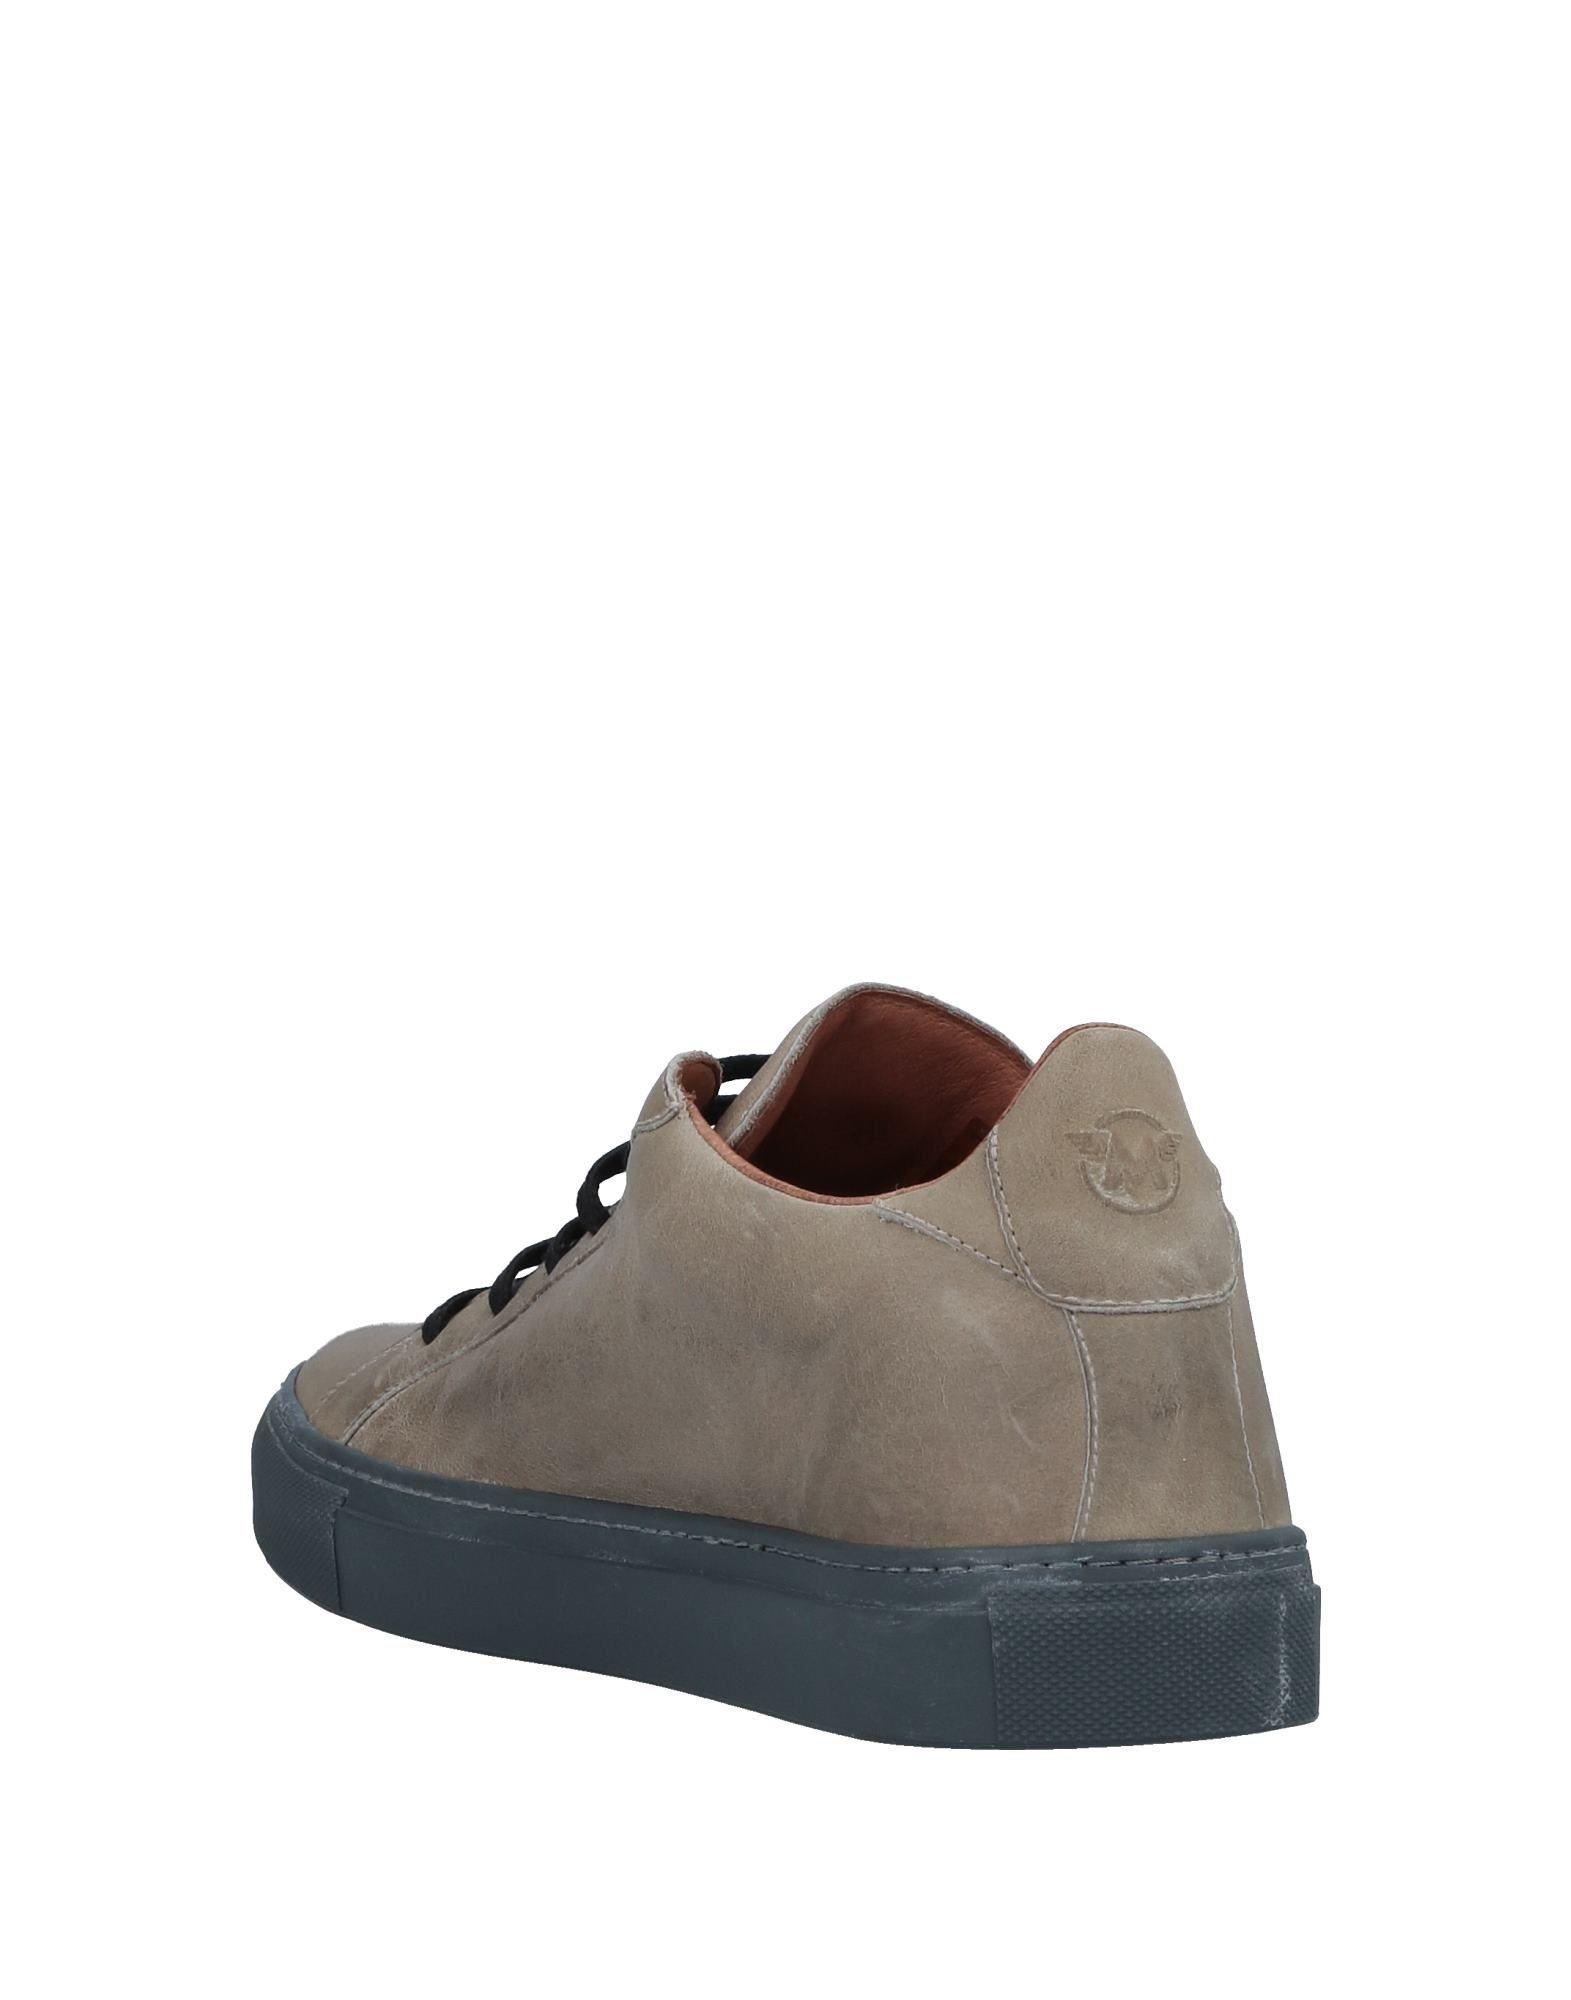 Matchless Sneakers Herren  11535085AR Gute Qualität beliebte Schuhe